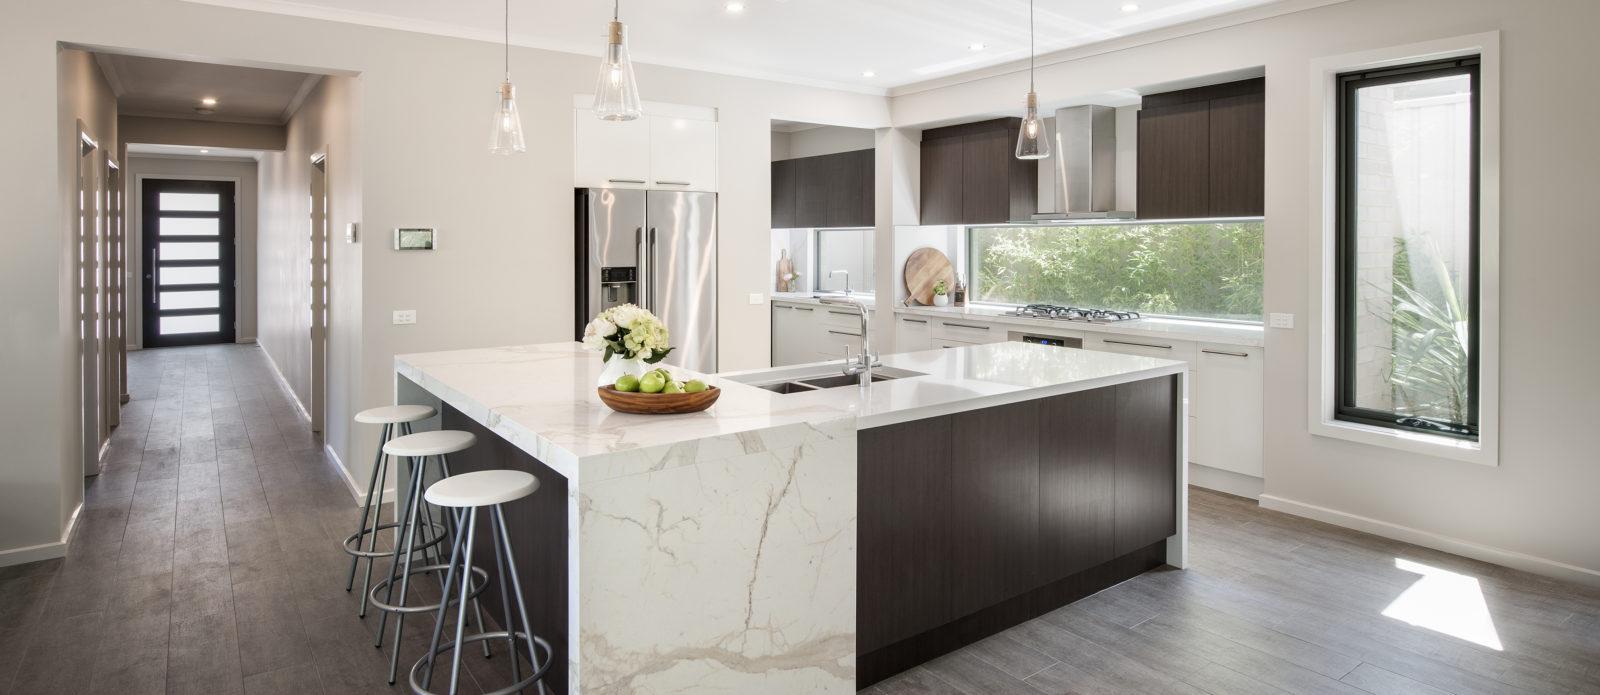 Granite Transformations - Cleveland, OH - granite countertop kitchen